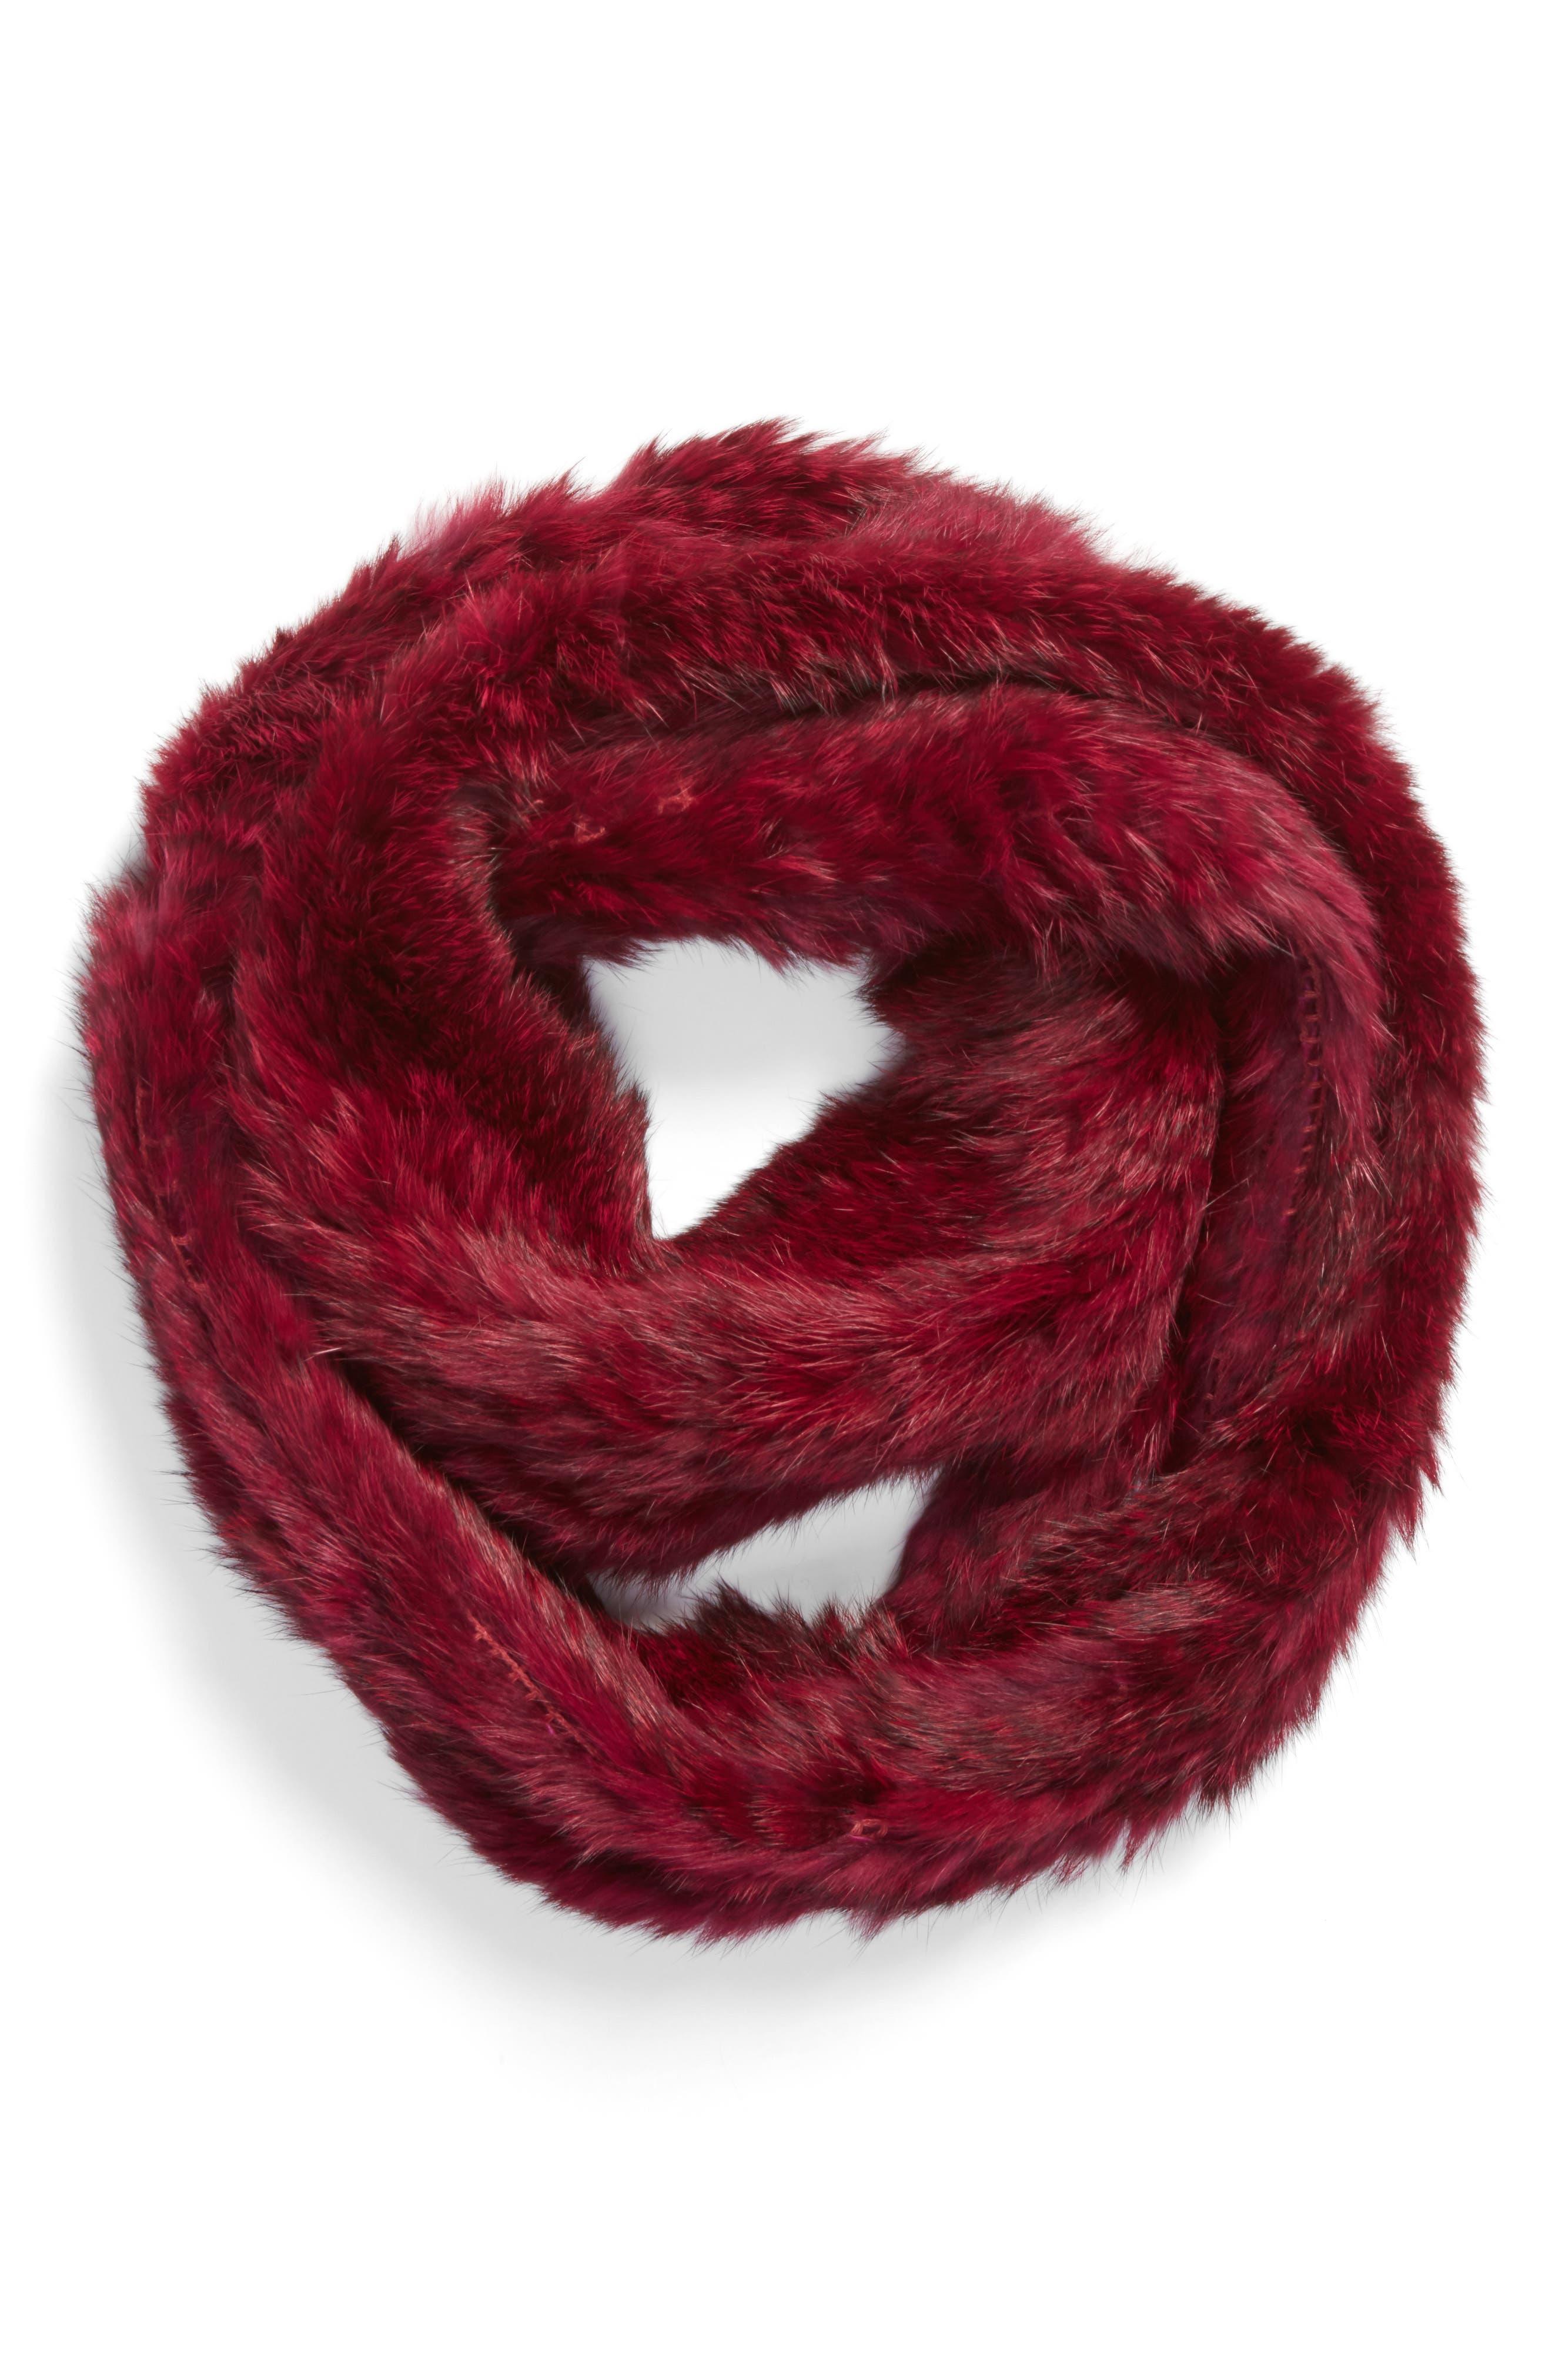 Overdyed Genuine Rabbit Fur Infinity Scarf,                             Alternate thumbnail 2, color,                             930